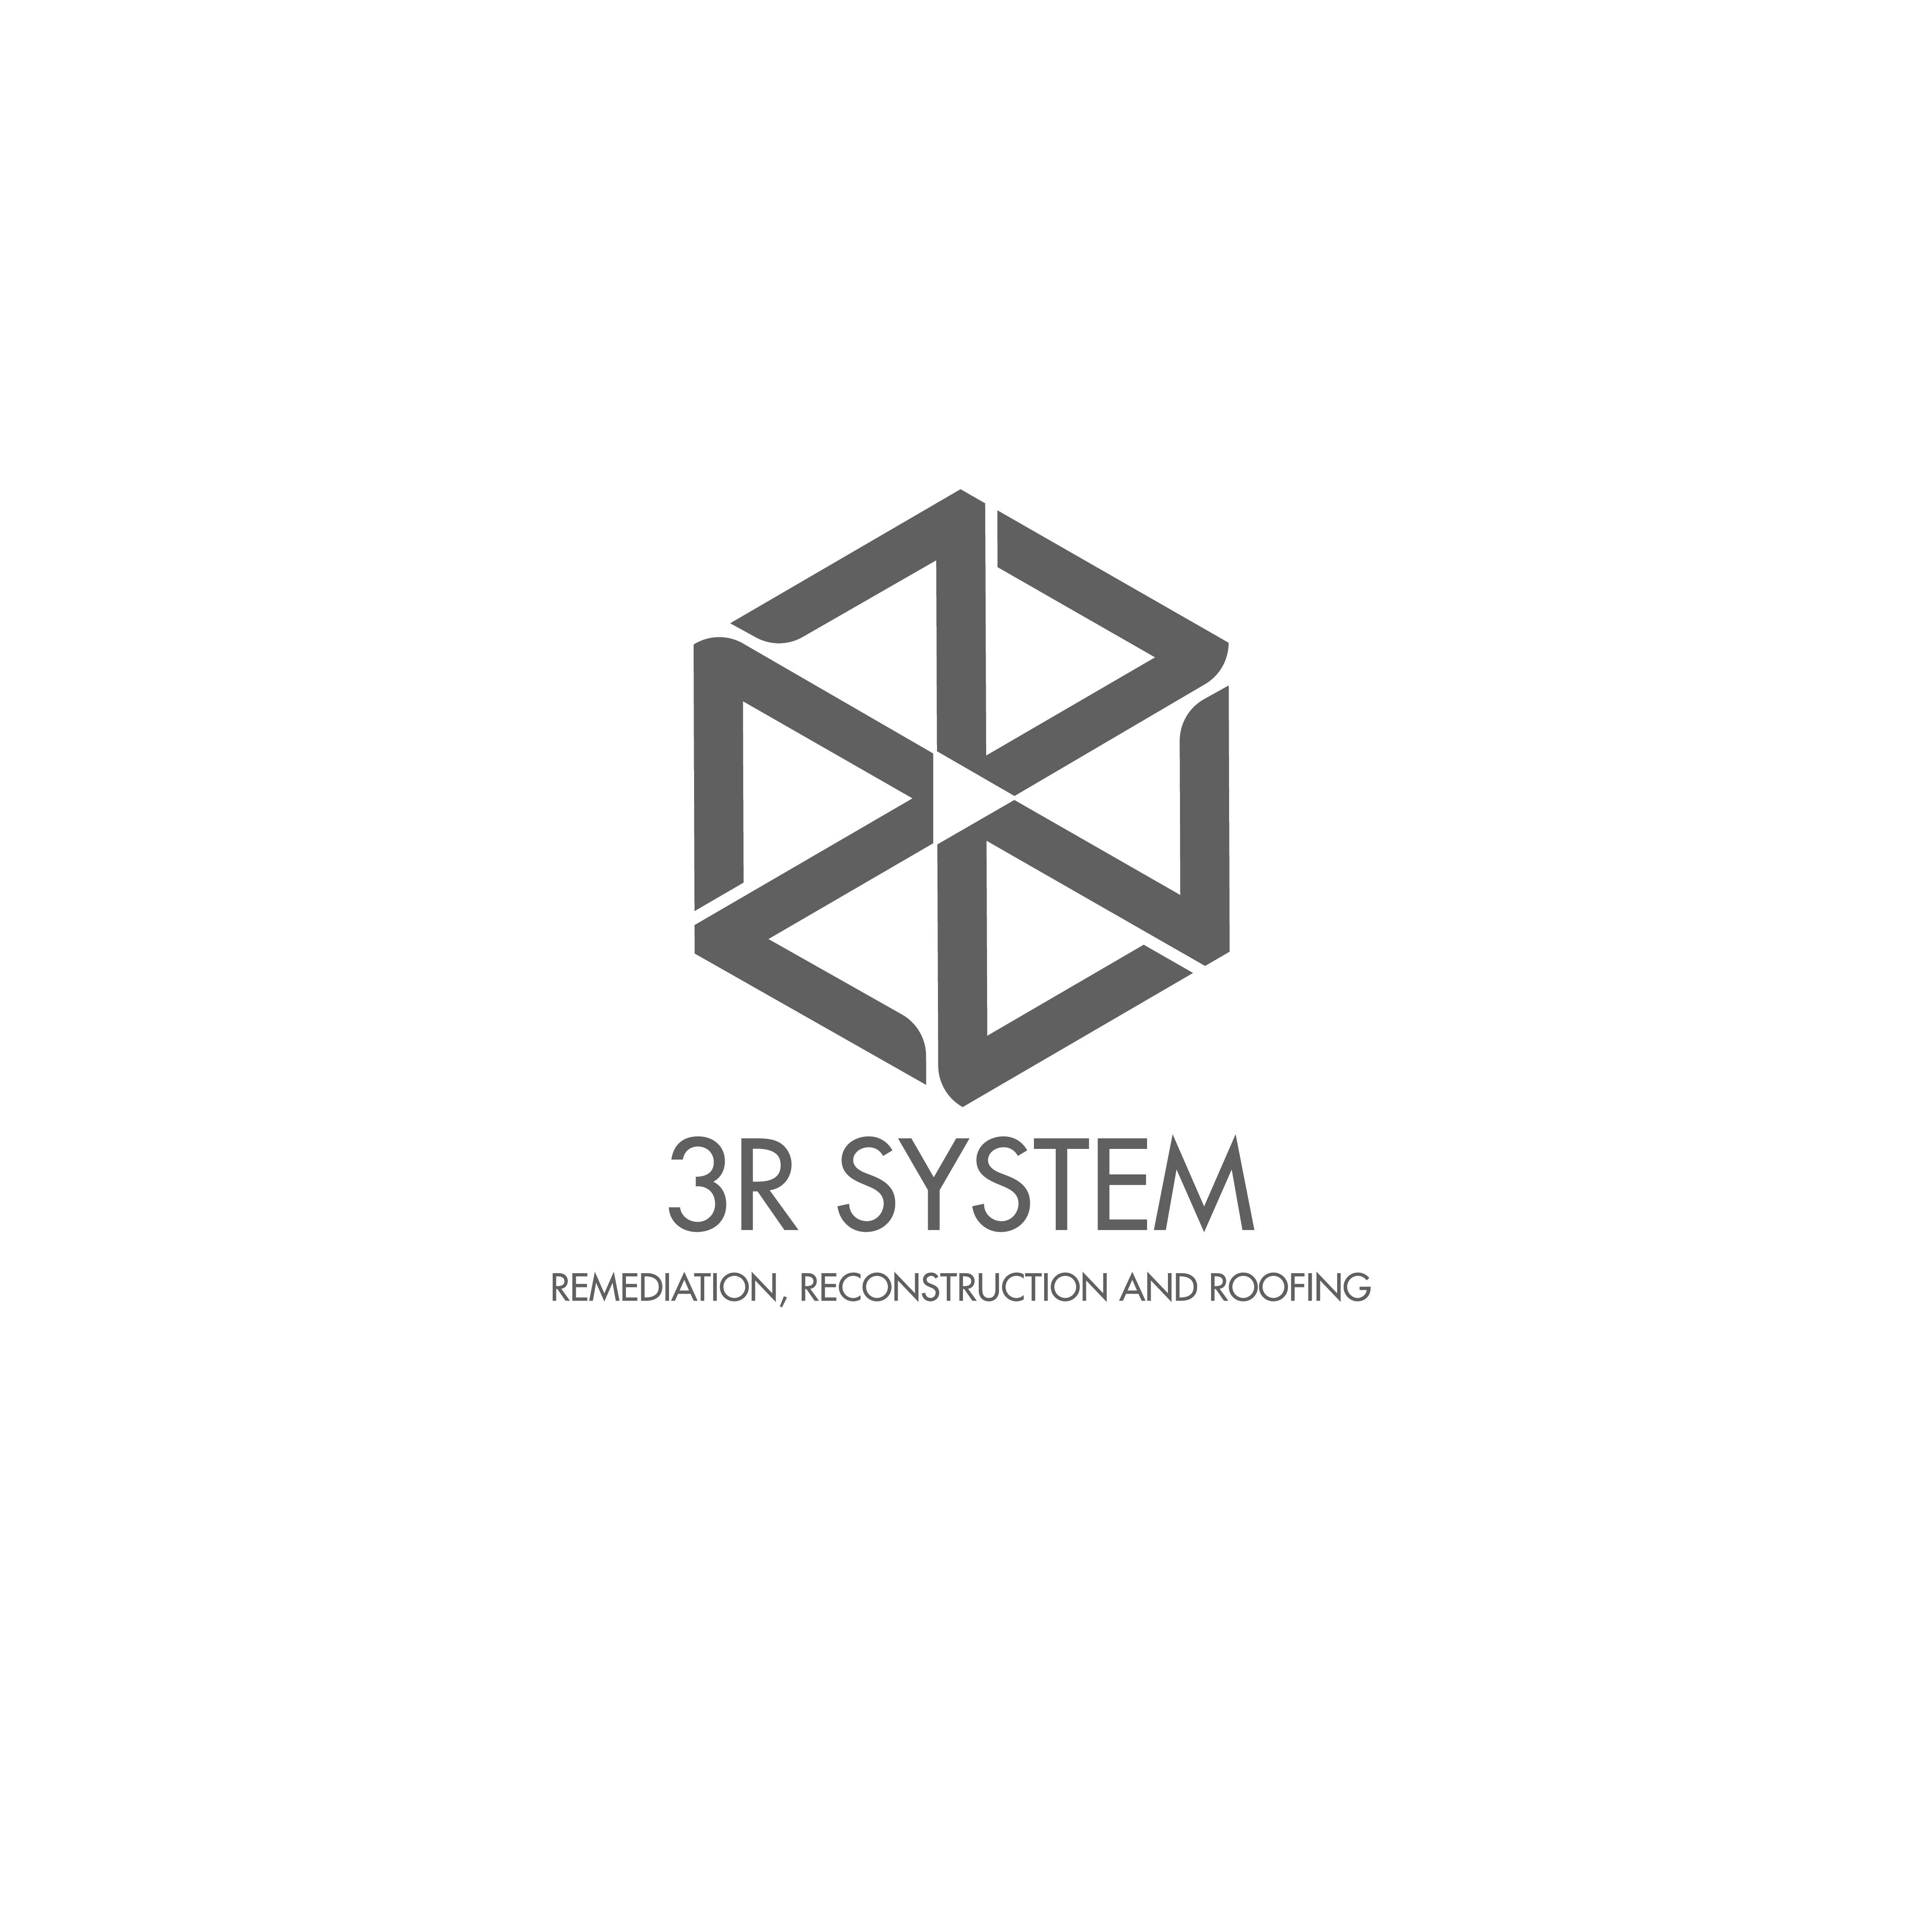 I will design creative minimalist luxurious business logo design in 12 hours